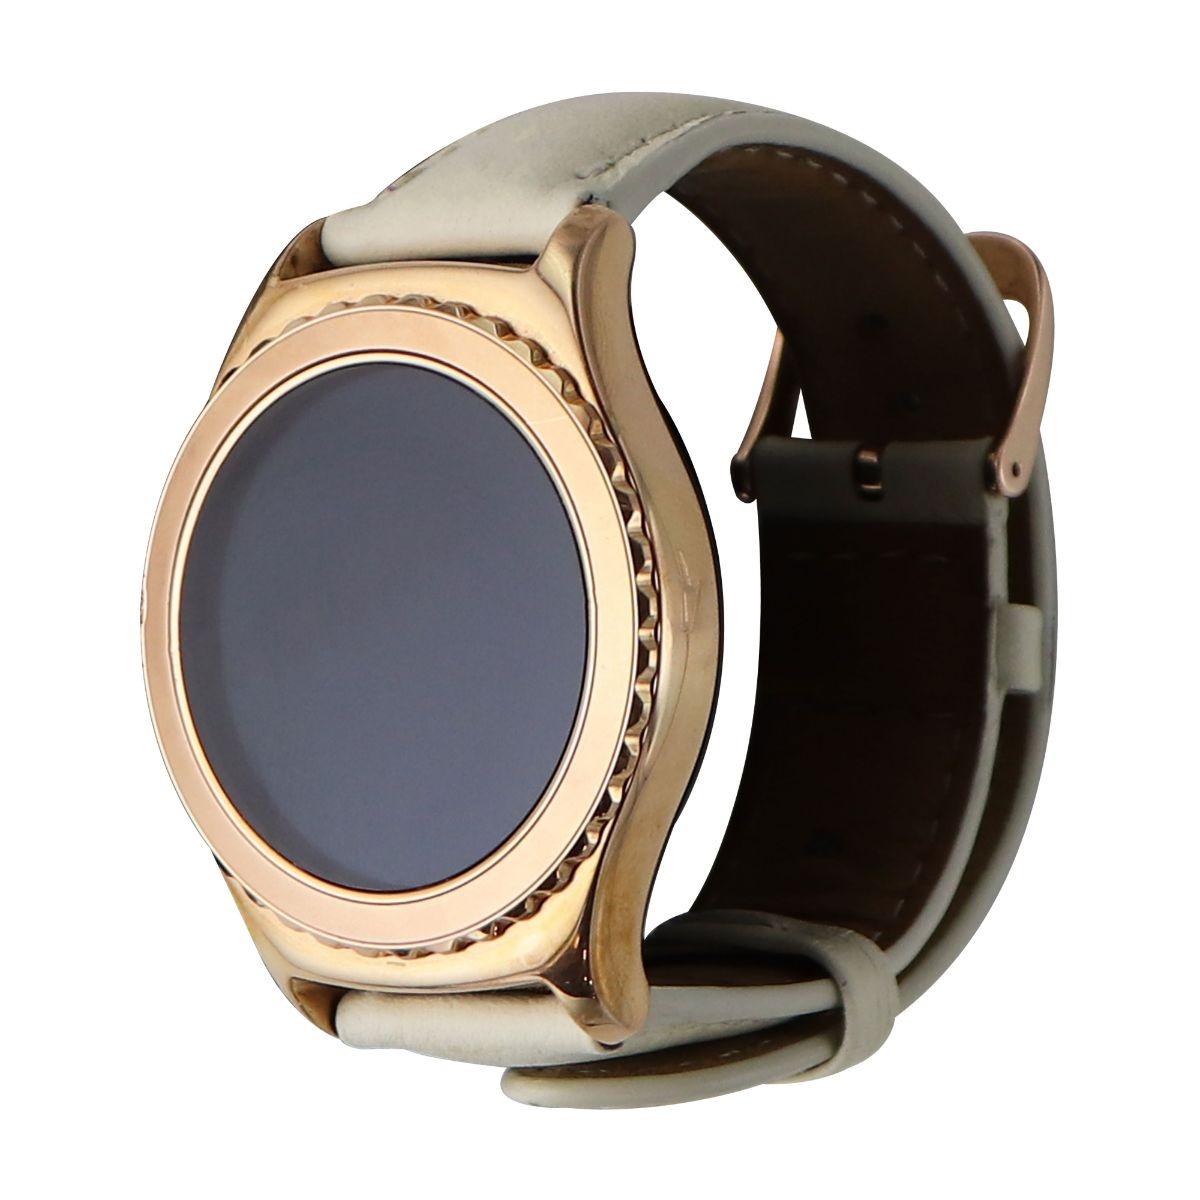 Samsung Gear S2 Smartwatch (SM-R732) - Classic Rose Gold